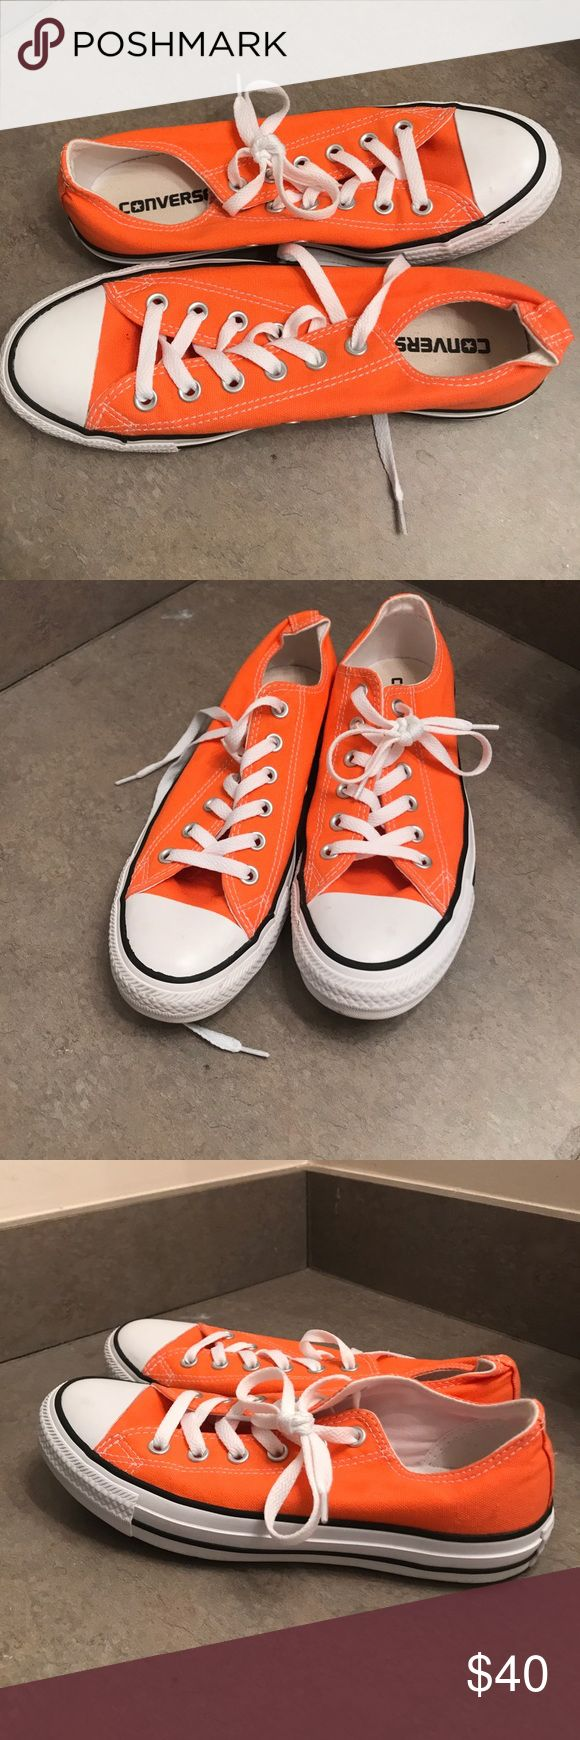 Orange Converse NWOT. Never worn. Orange size 7 men's/ 9 women's converse. Converse Shoes Sneakers